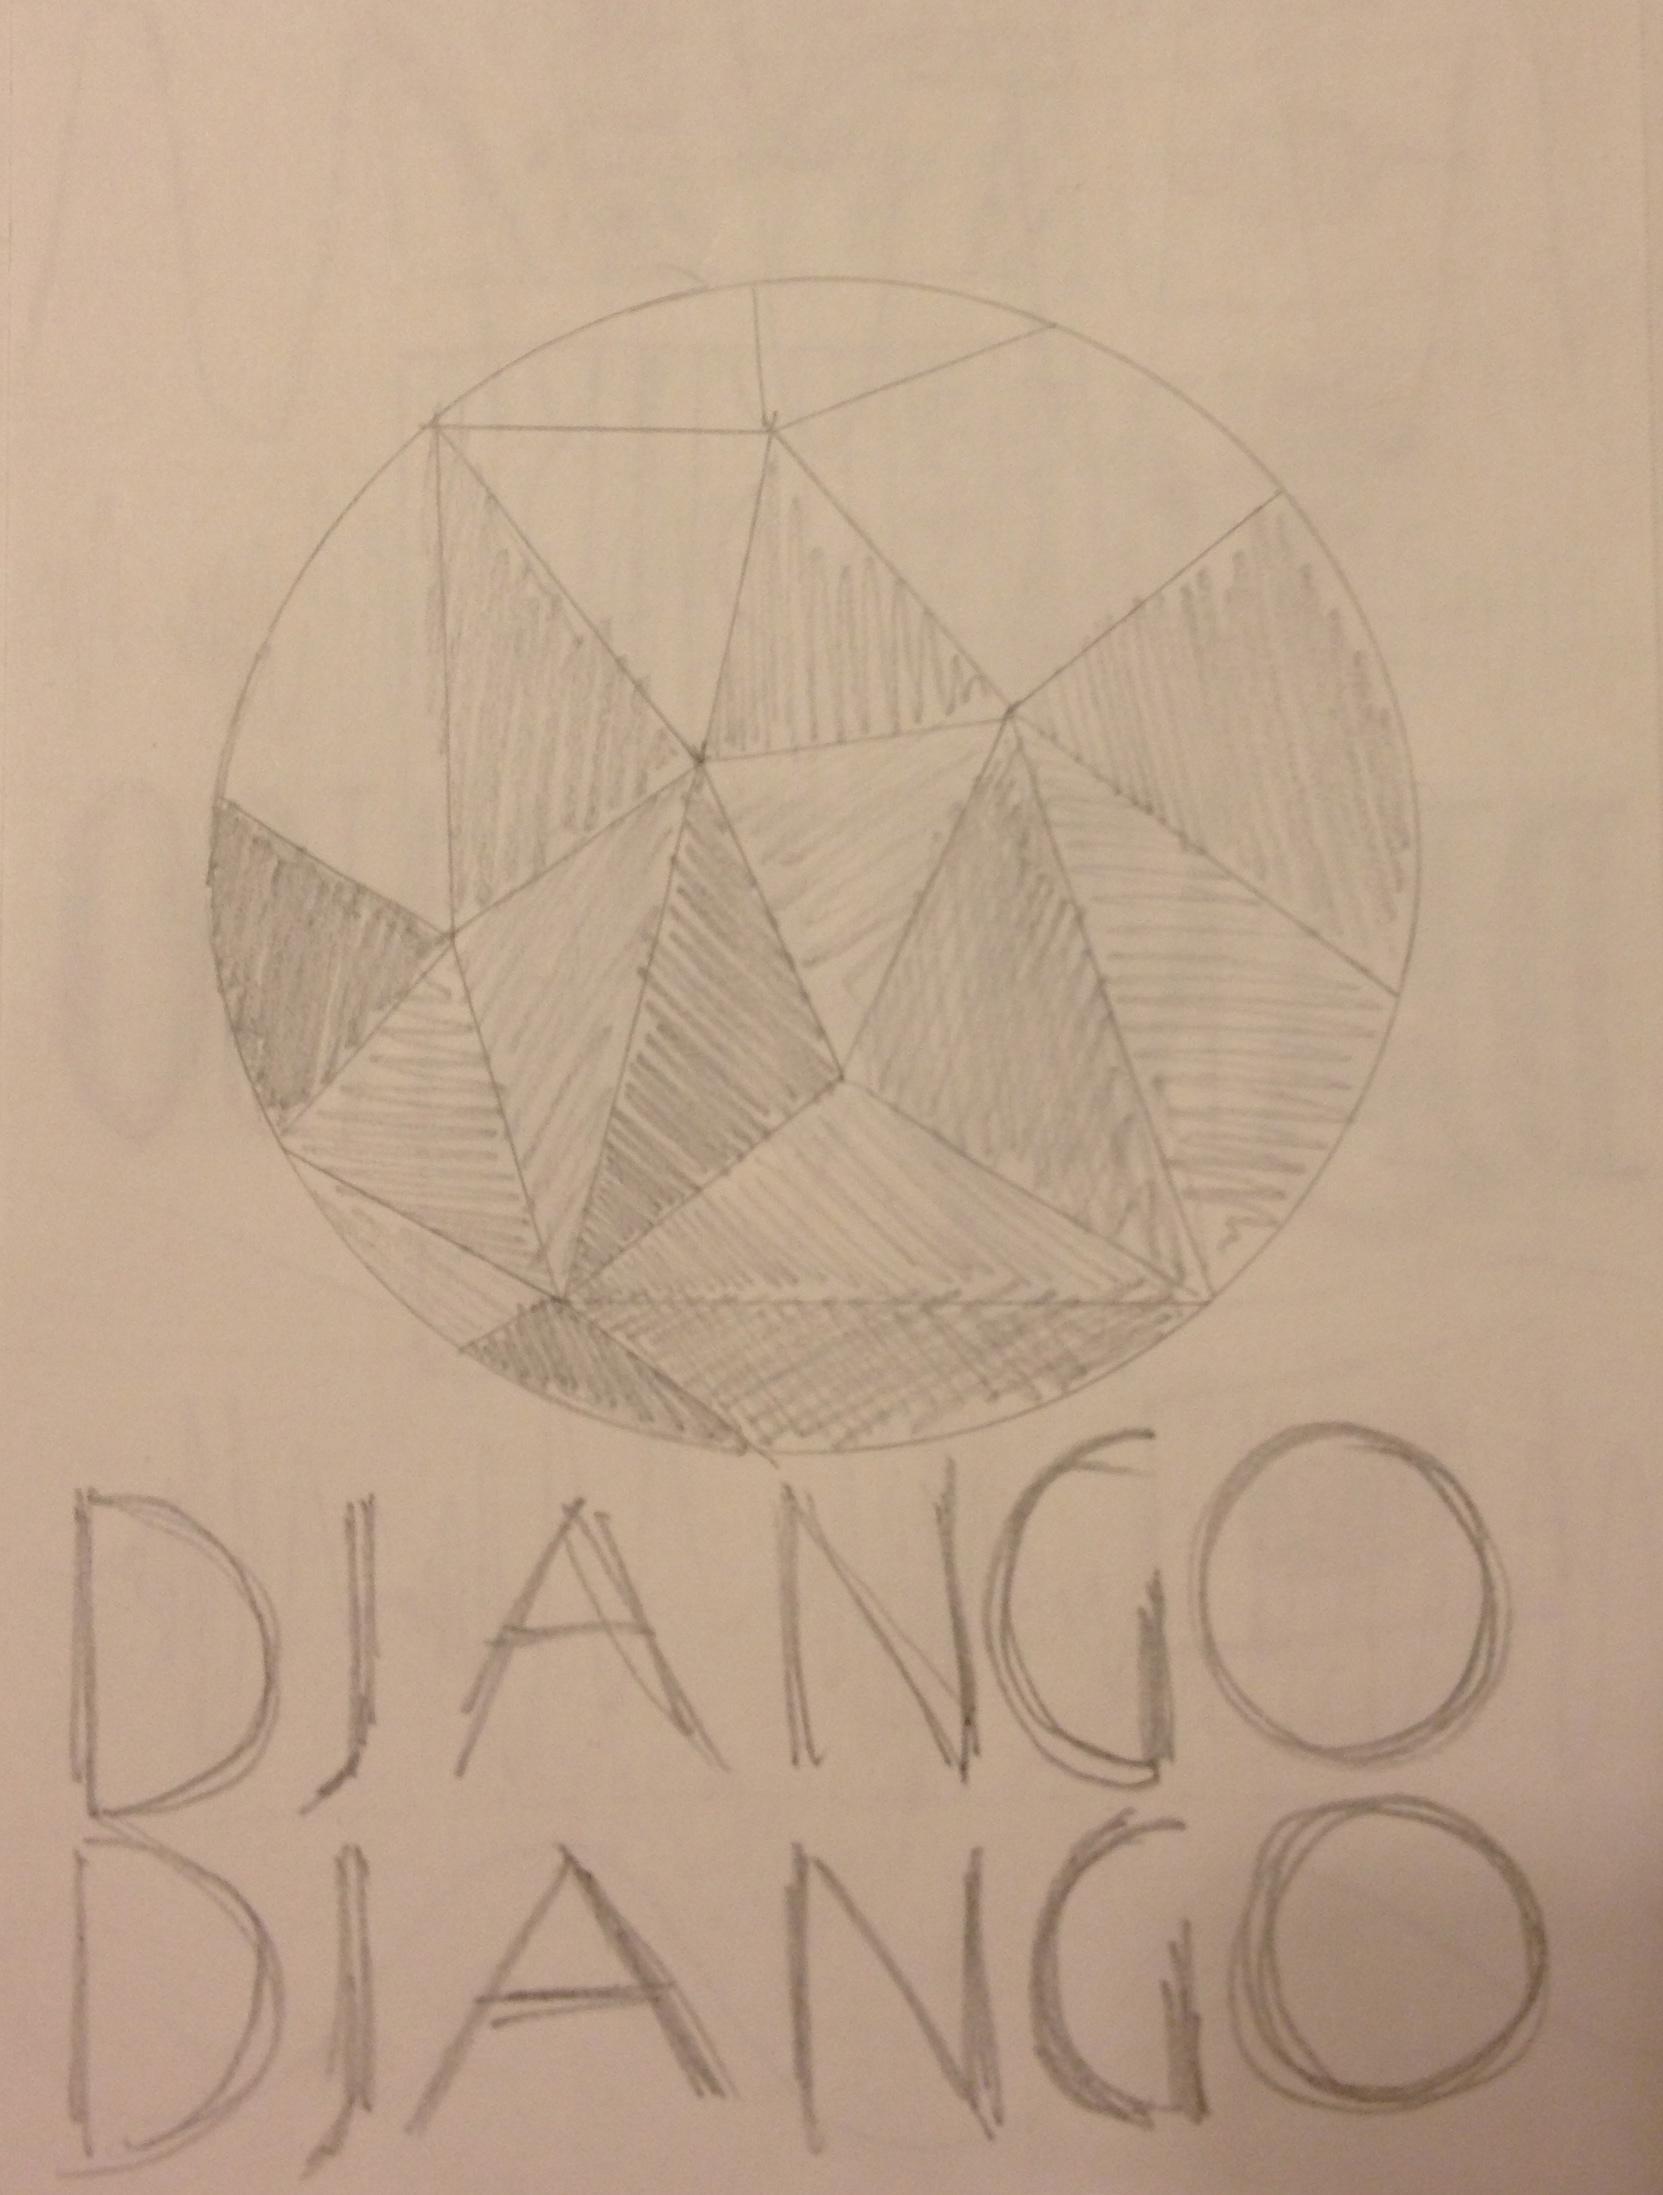 Django Django @ Los Angeles, CA - image 6 - student project